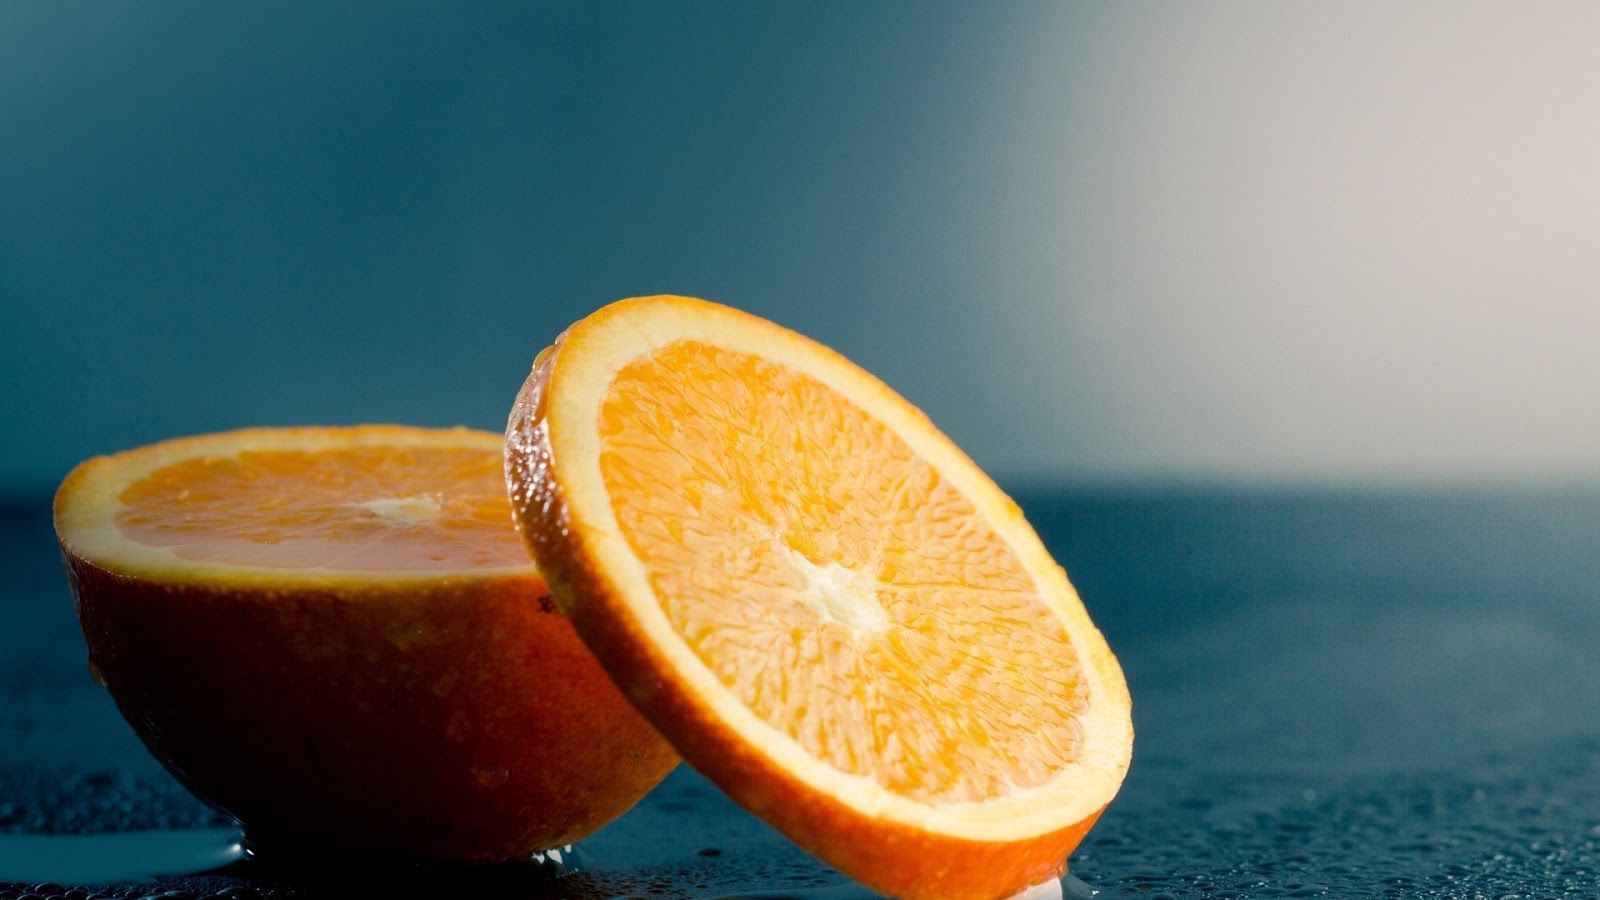 Best High Definition Wallpapers 1stwallpaper Com Fruit Wallpaper Orange Water Orange Slices Hd wallpaper orange slice bubbles macro